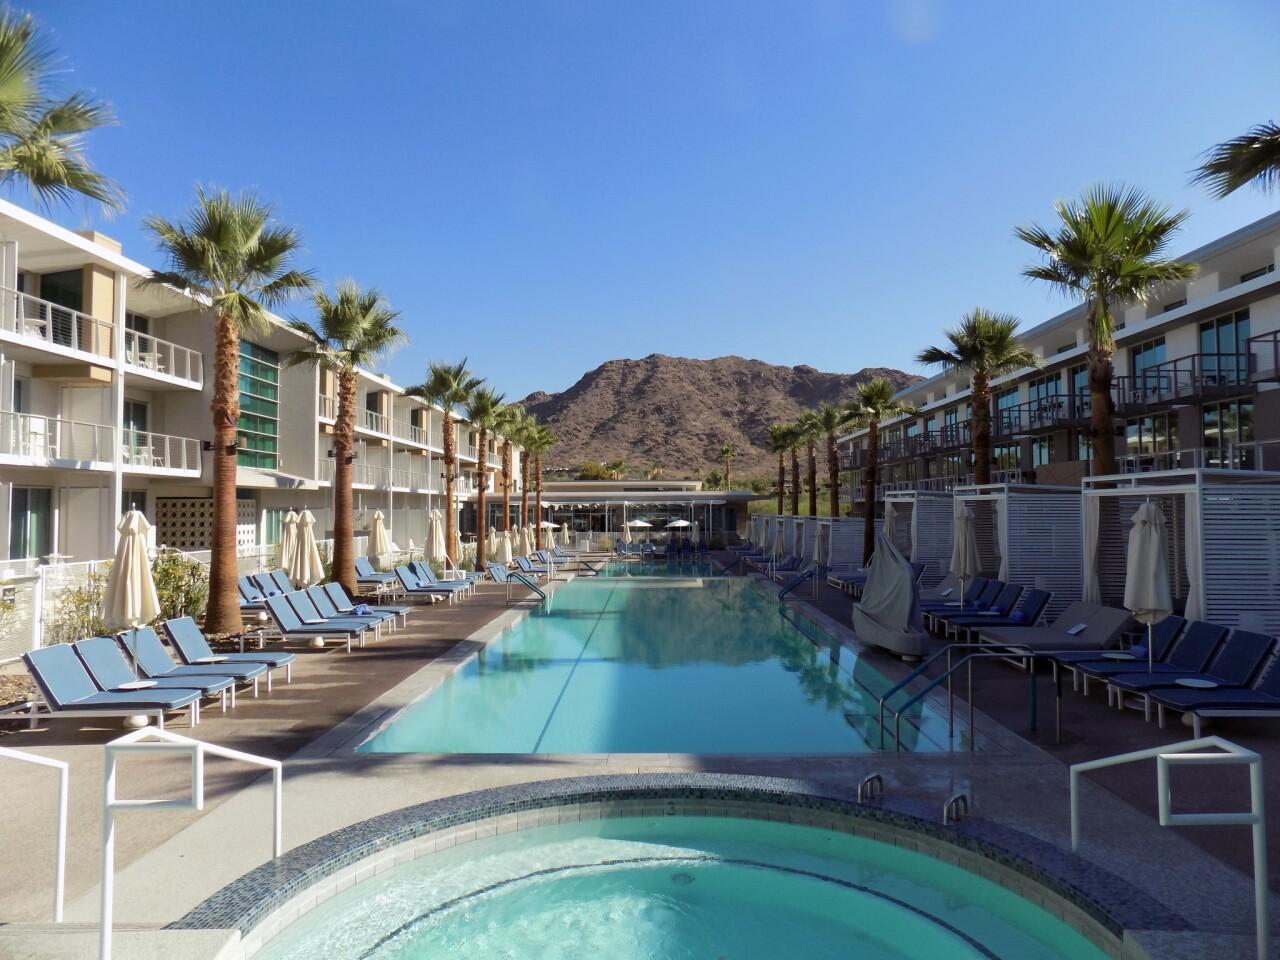 The pool at Mountain Shadows resort has a stunning backdrop.